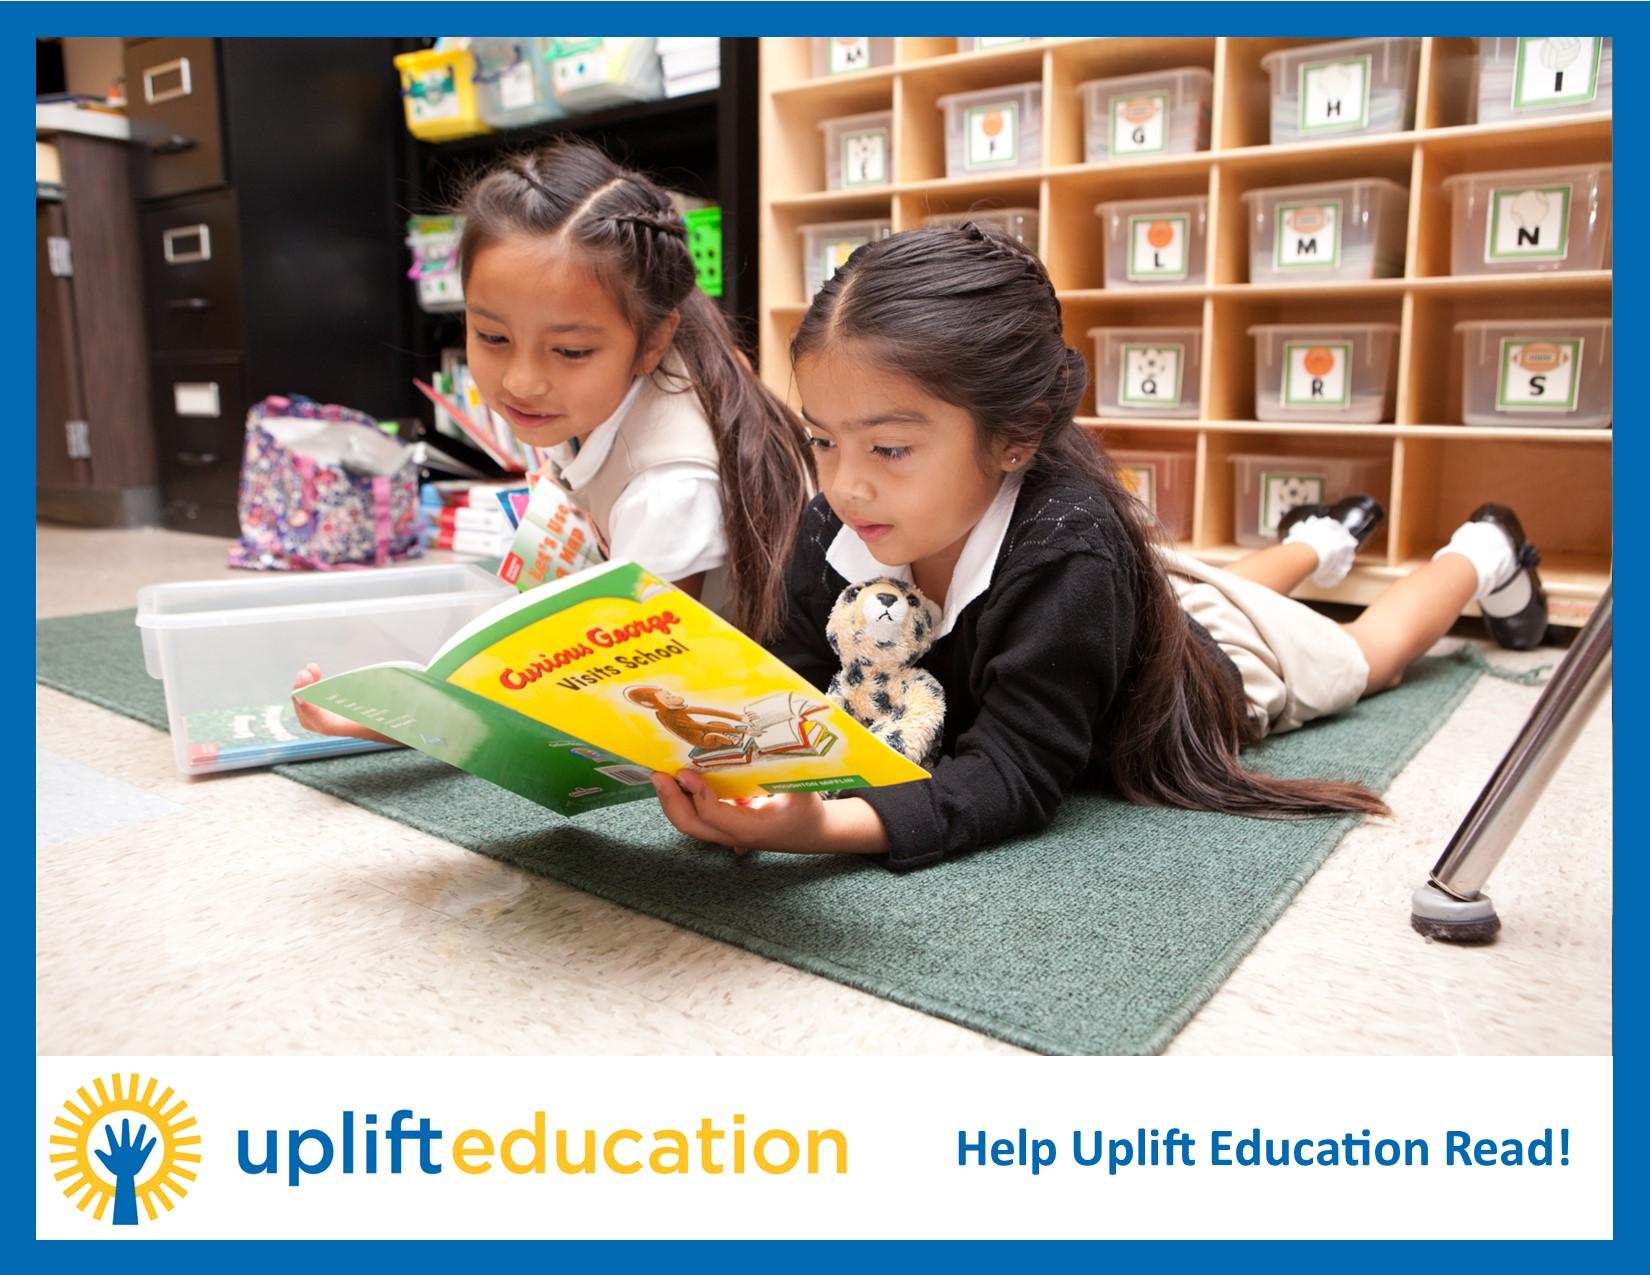 Tarrant County, Help Uplift Education Read!